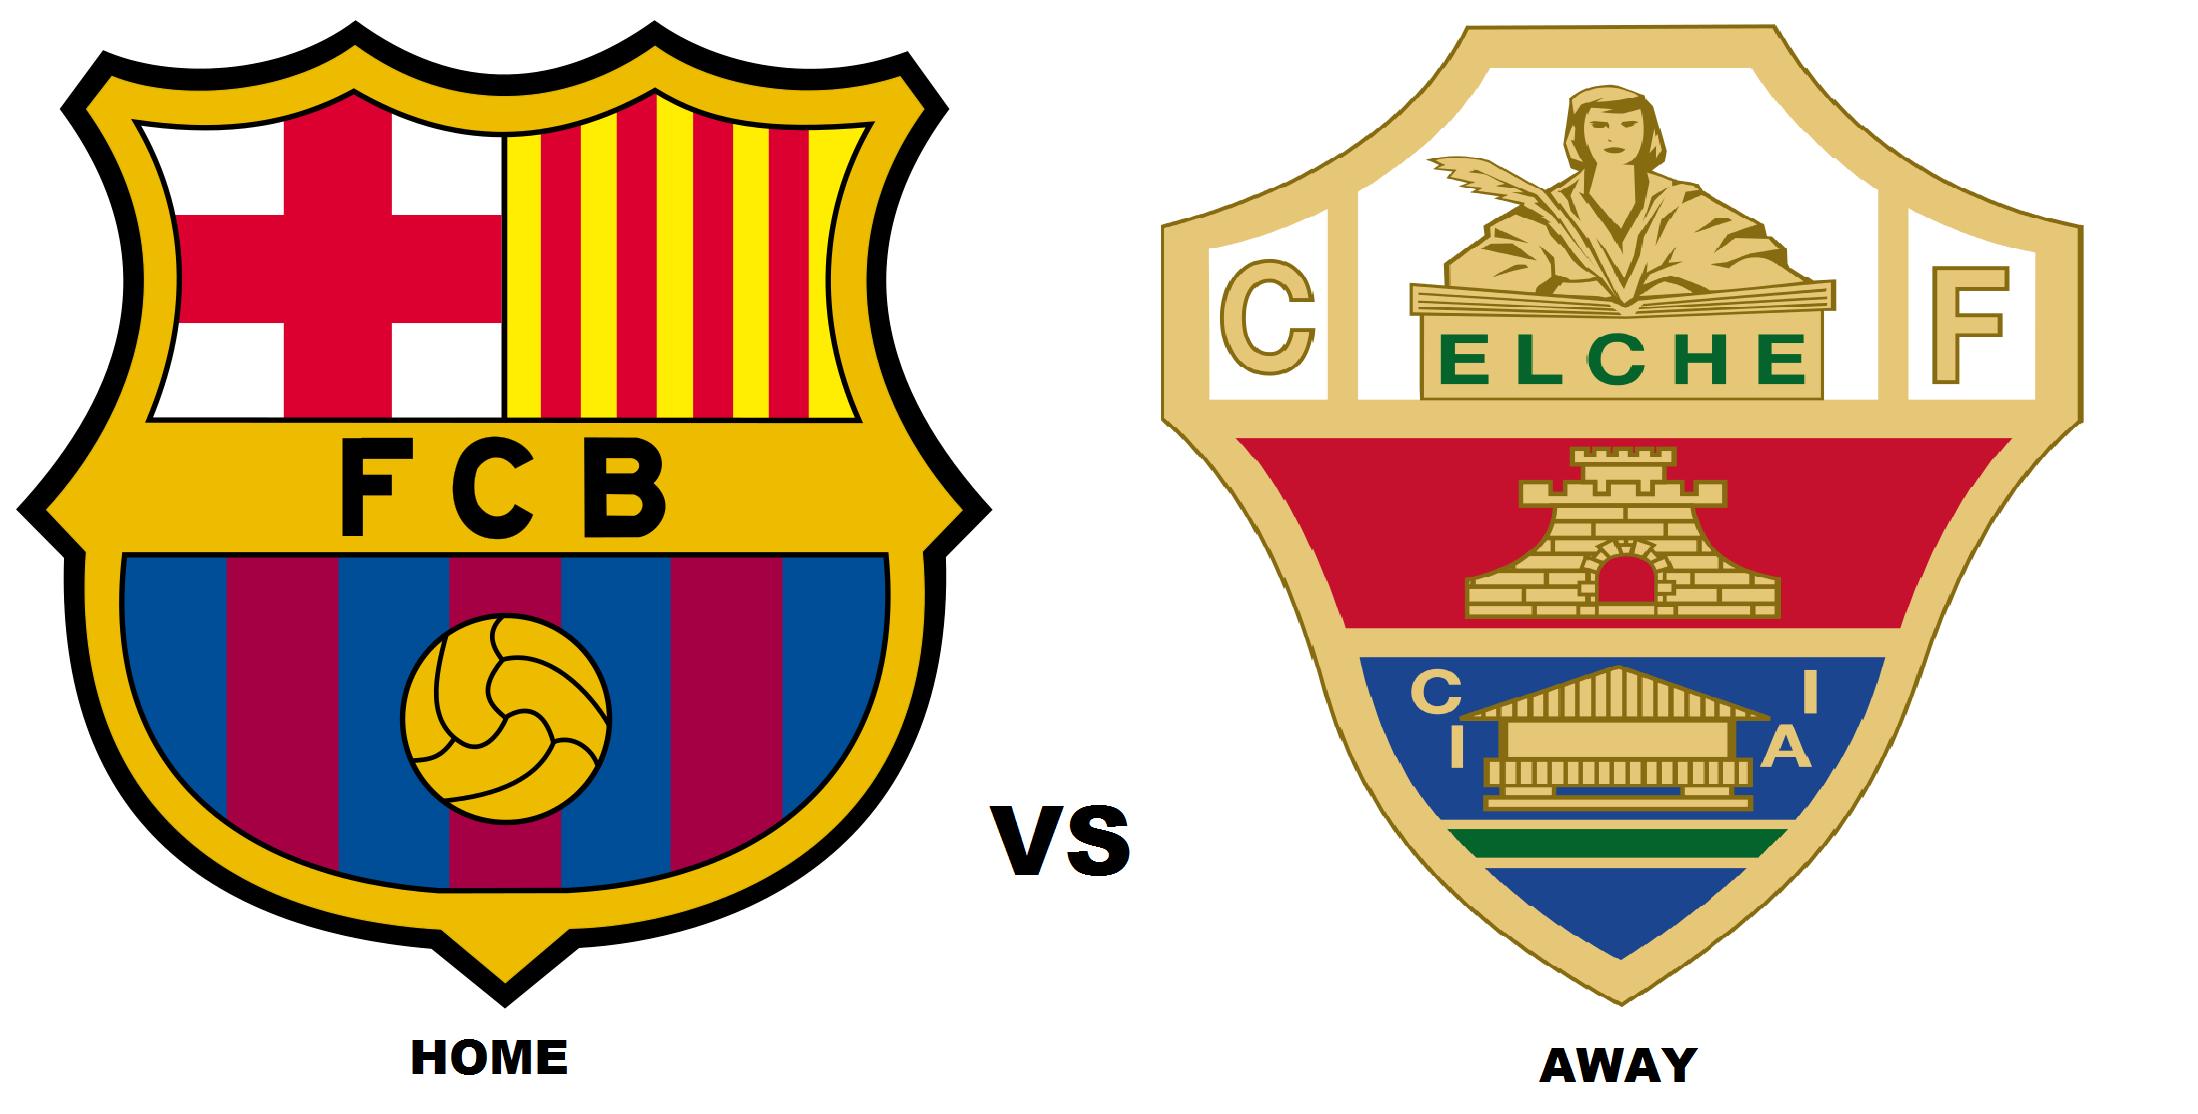 512x512 Barcelona Logos